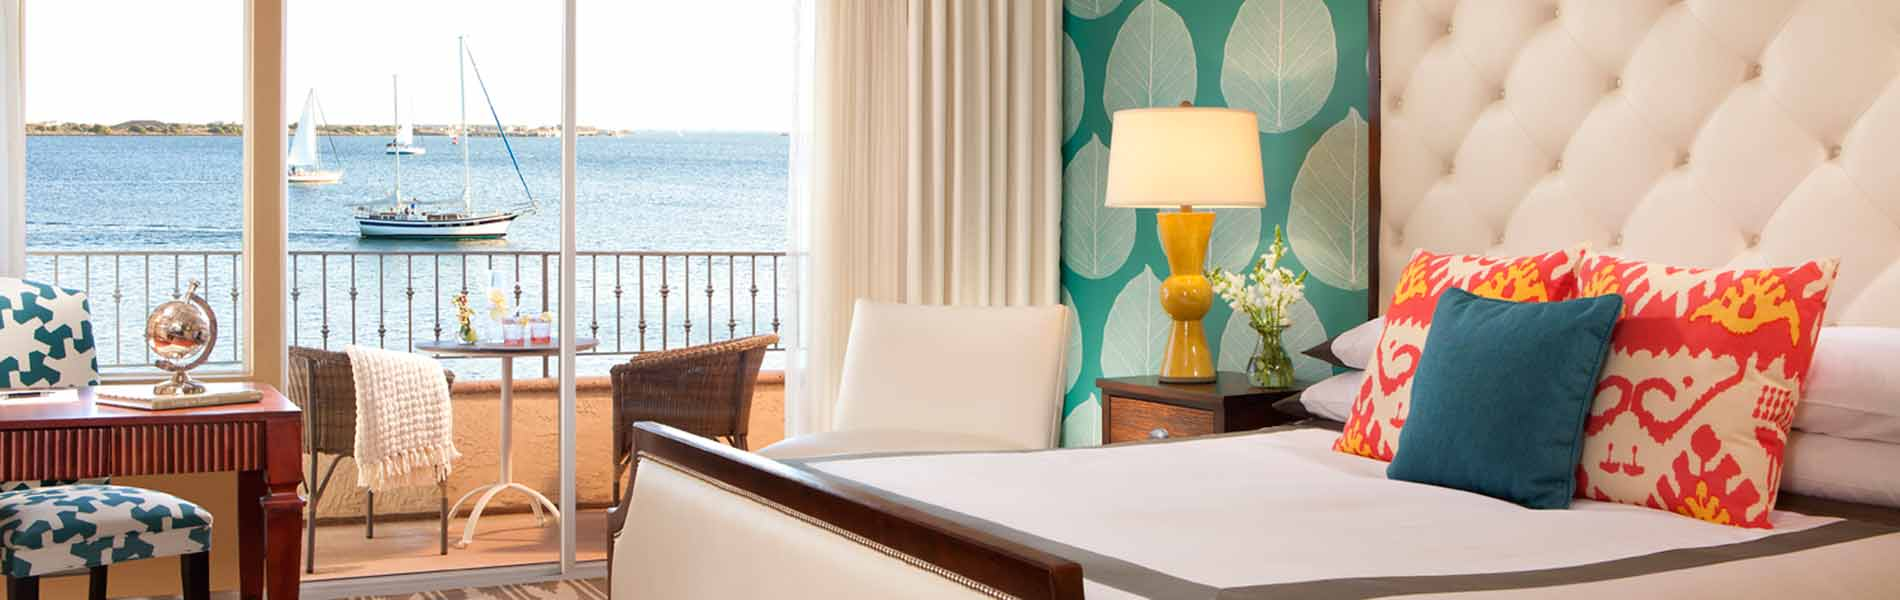 Kona Kai Resort waterfront guest rooms